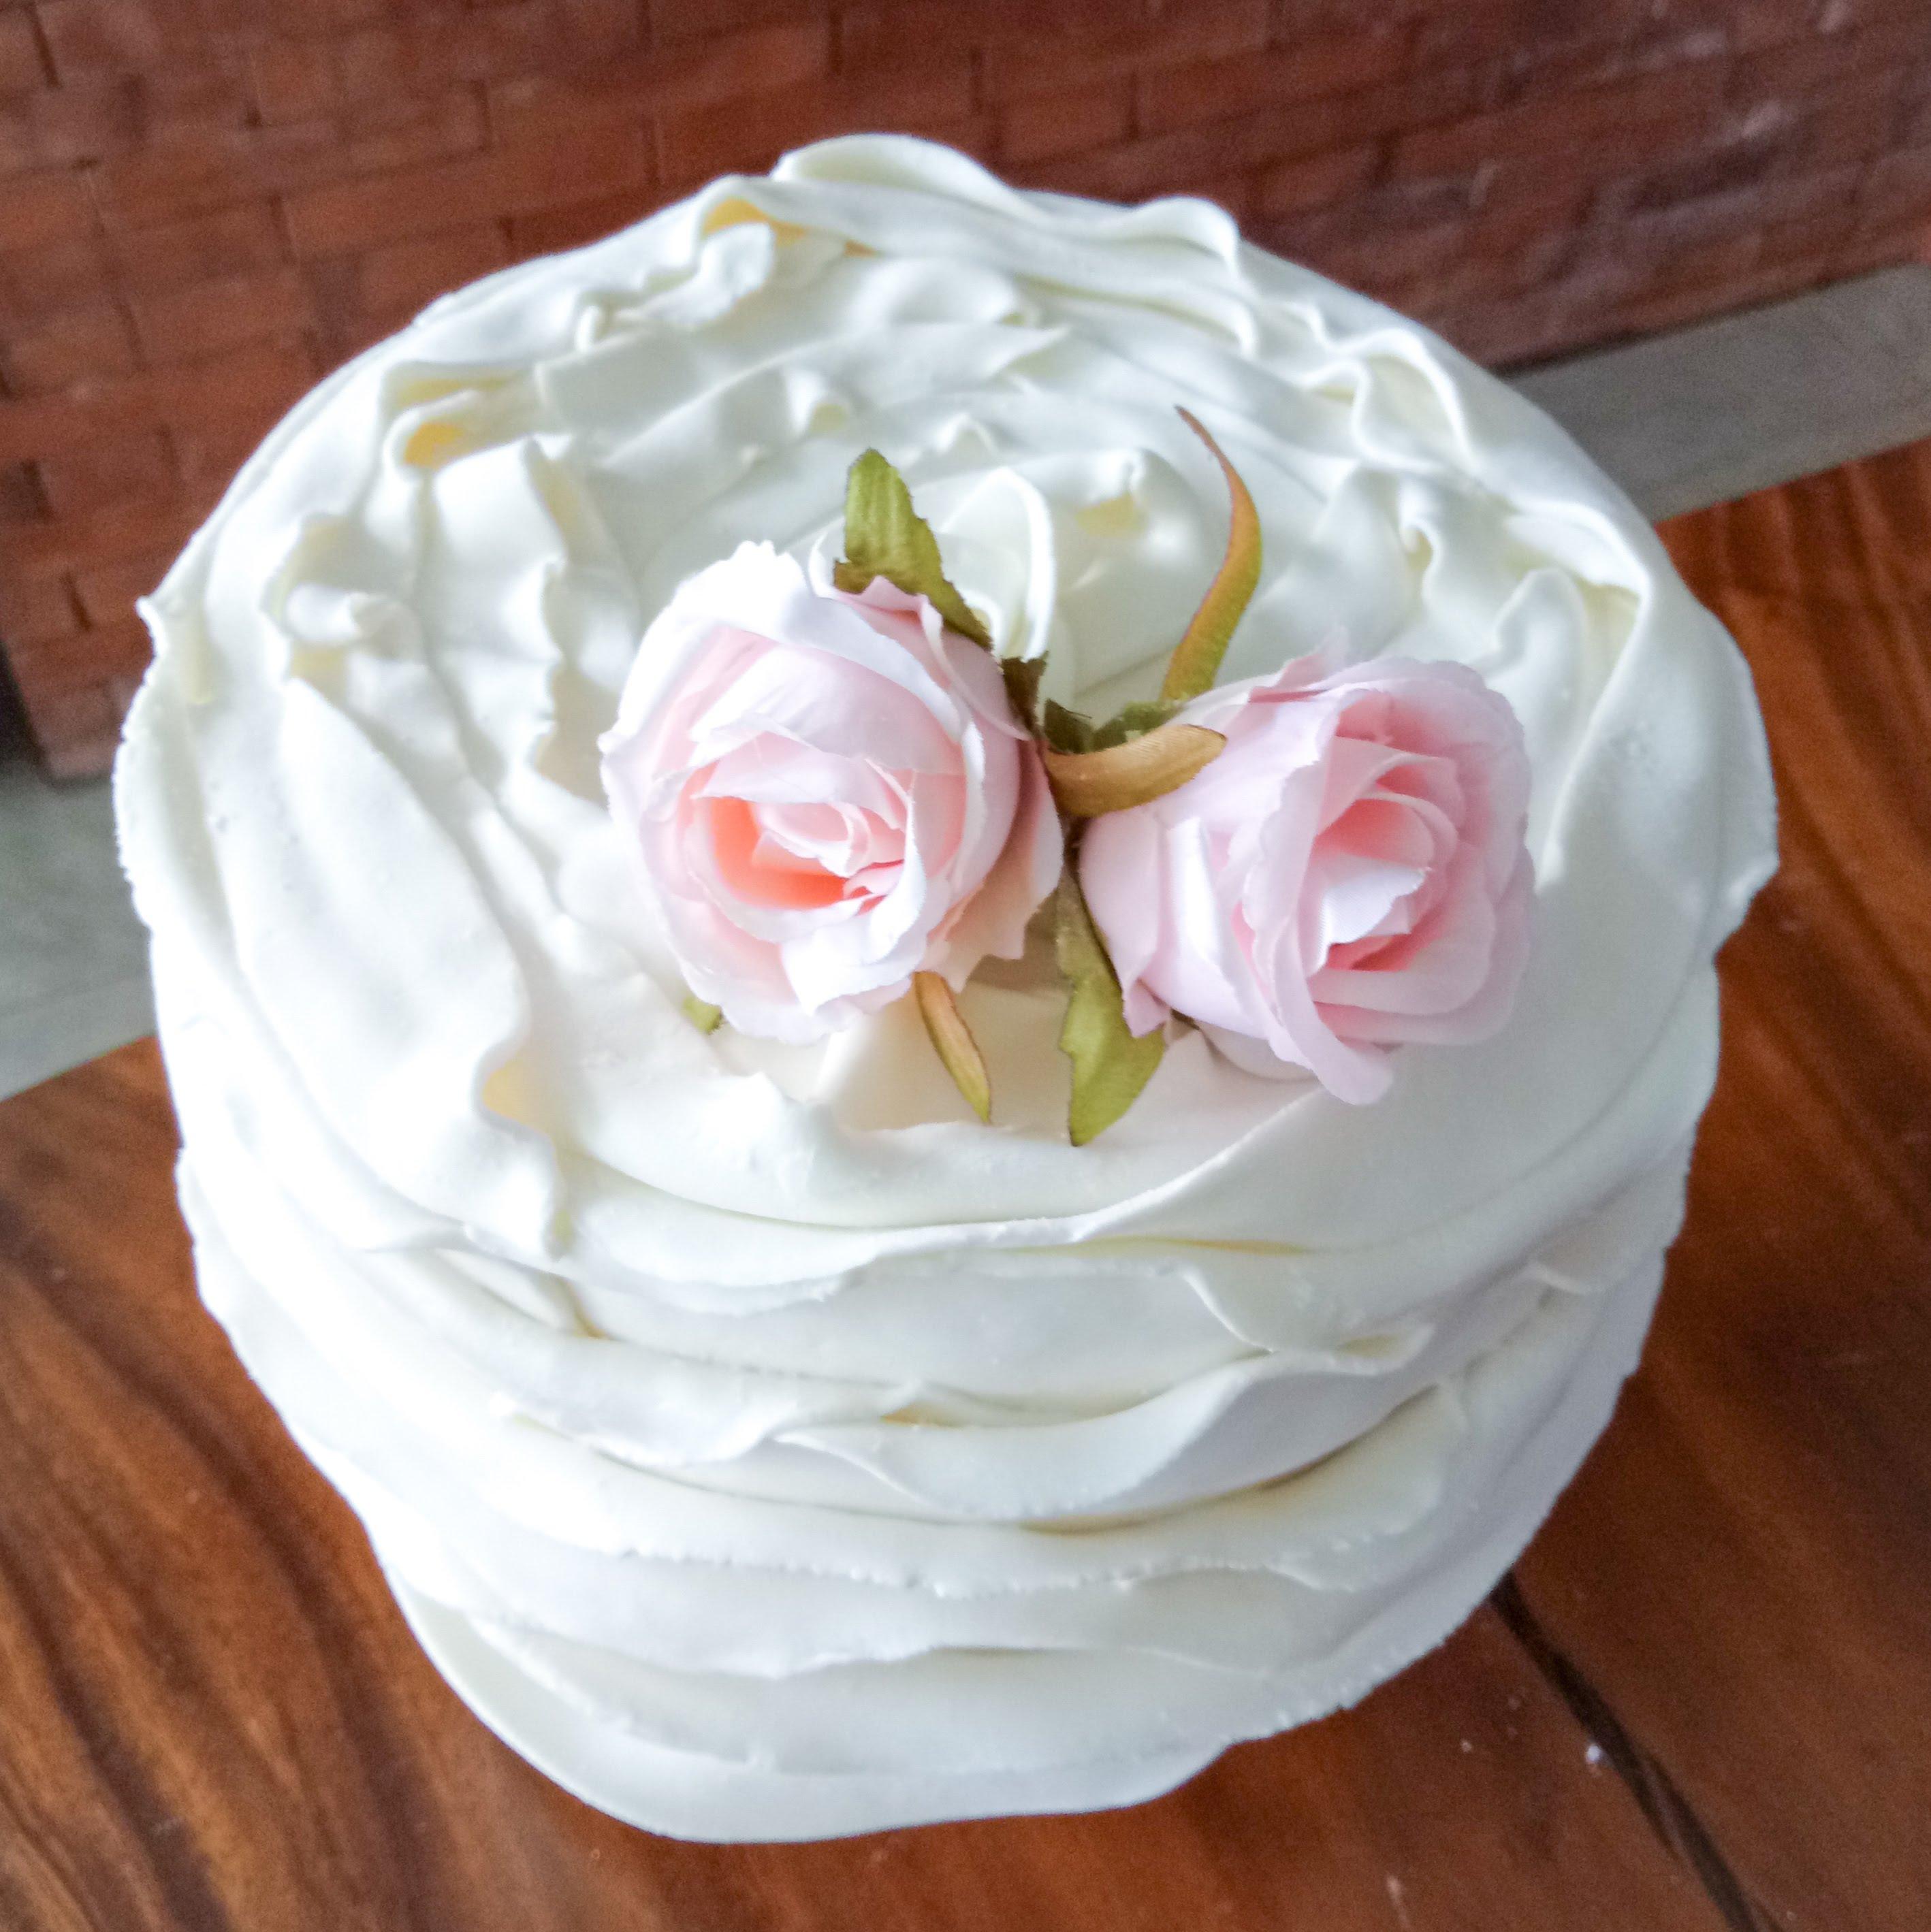 Dorable Bali Wedding Cakes Frieze - The Wedding Ideas ...